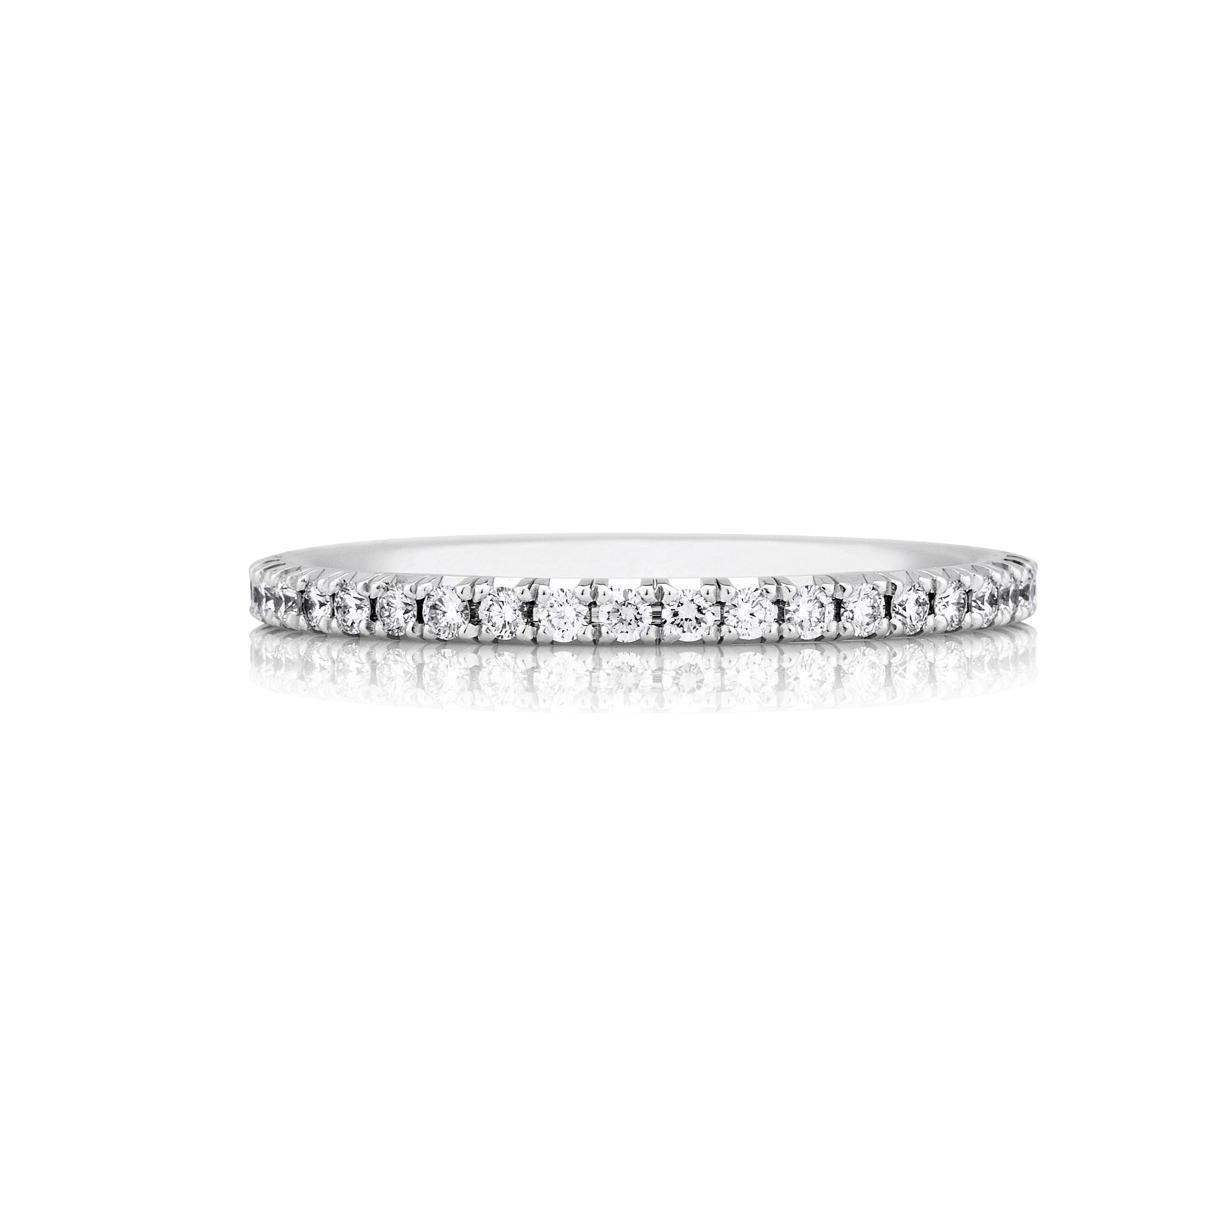 Platinum Eternity Wedding Ring By Jewelove